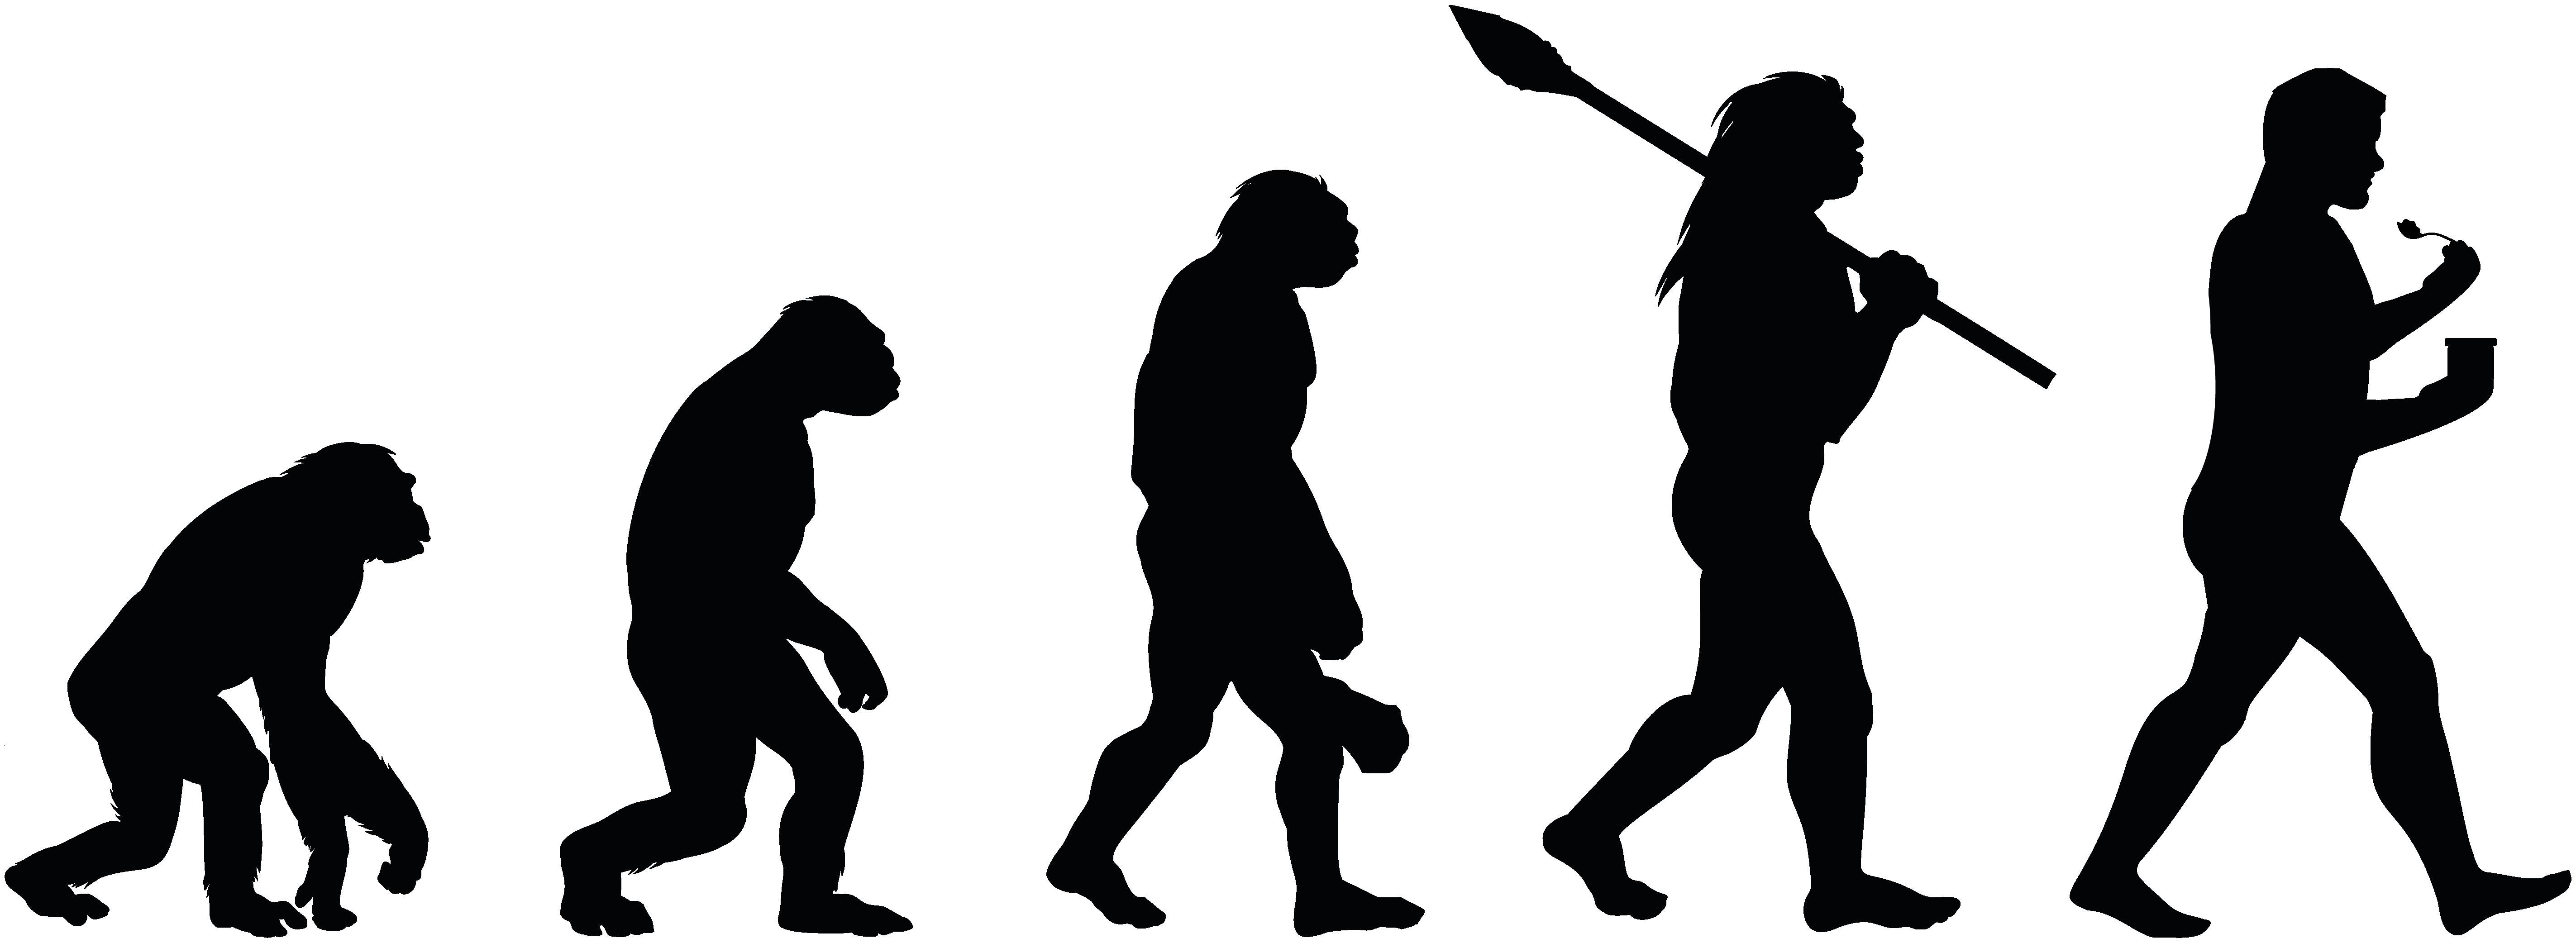 Pakery - (R)evolution